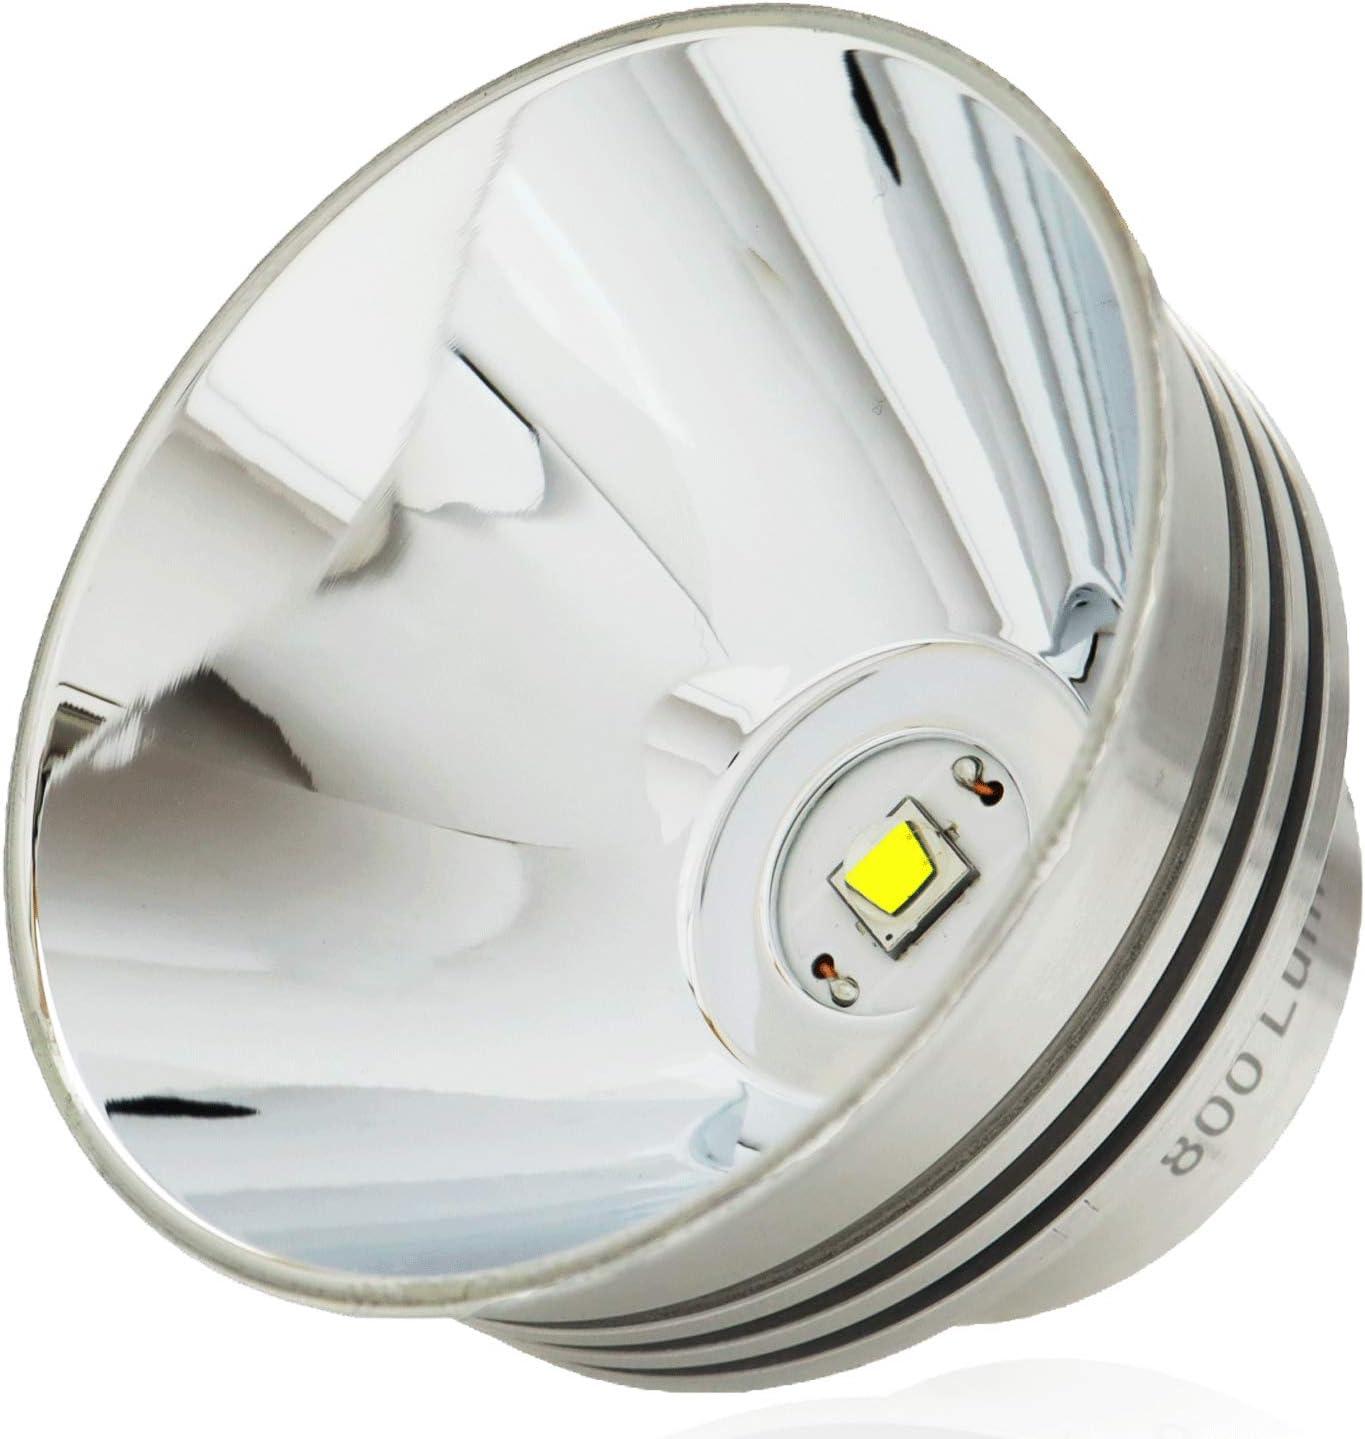 Kit conversion a LED para maglite 3 4 5 6 D (800 lumenes)